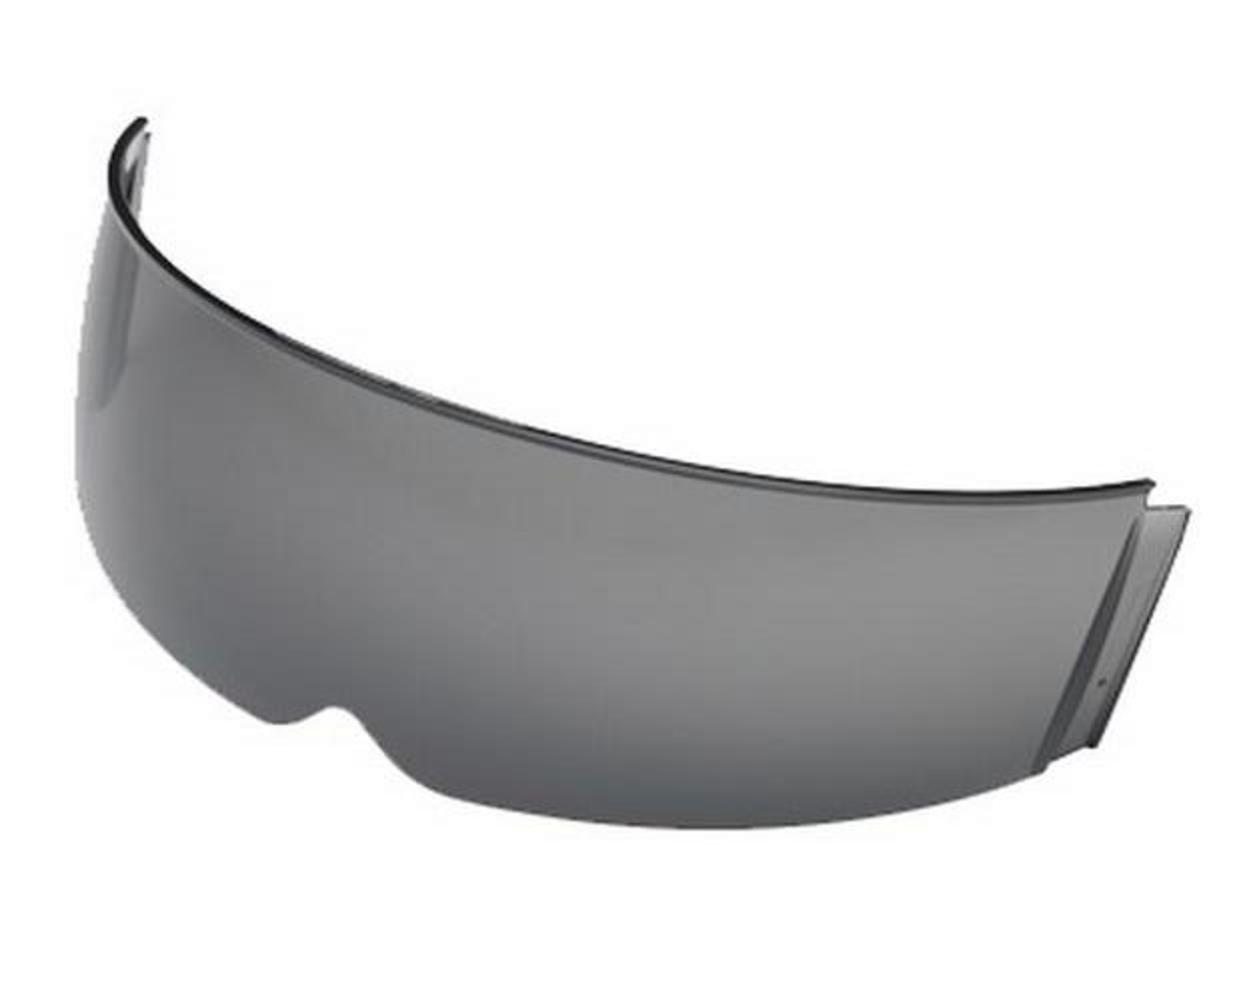 Scorpion Speedview Sun Visor EXO-900 Road Race Motorcycle Helmet Accessories - Dark Smoke / One Size